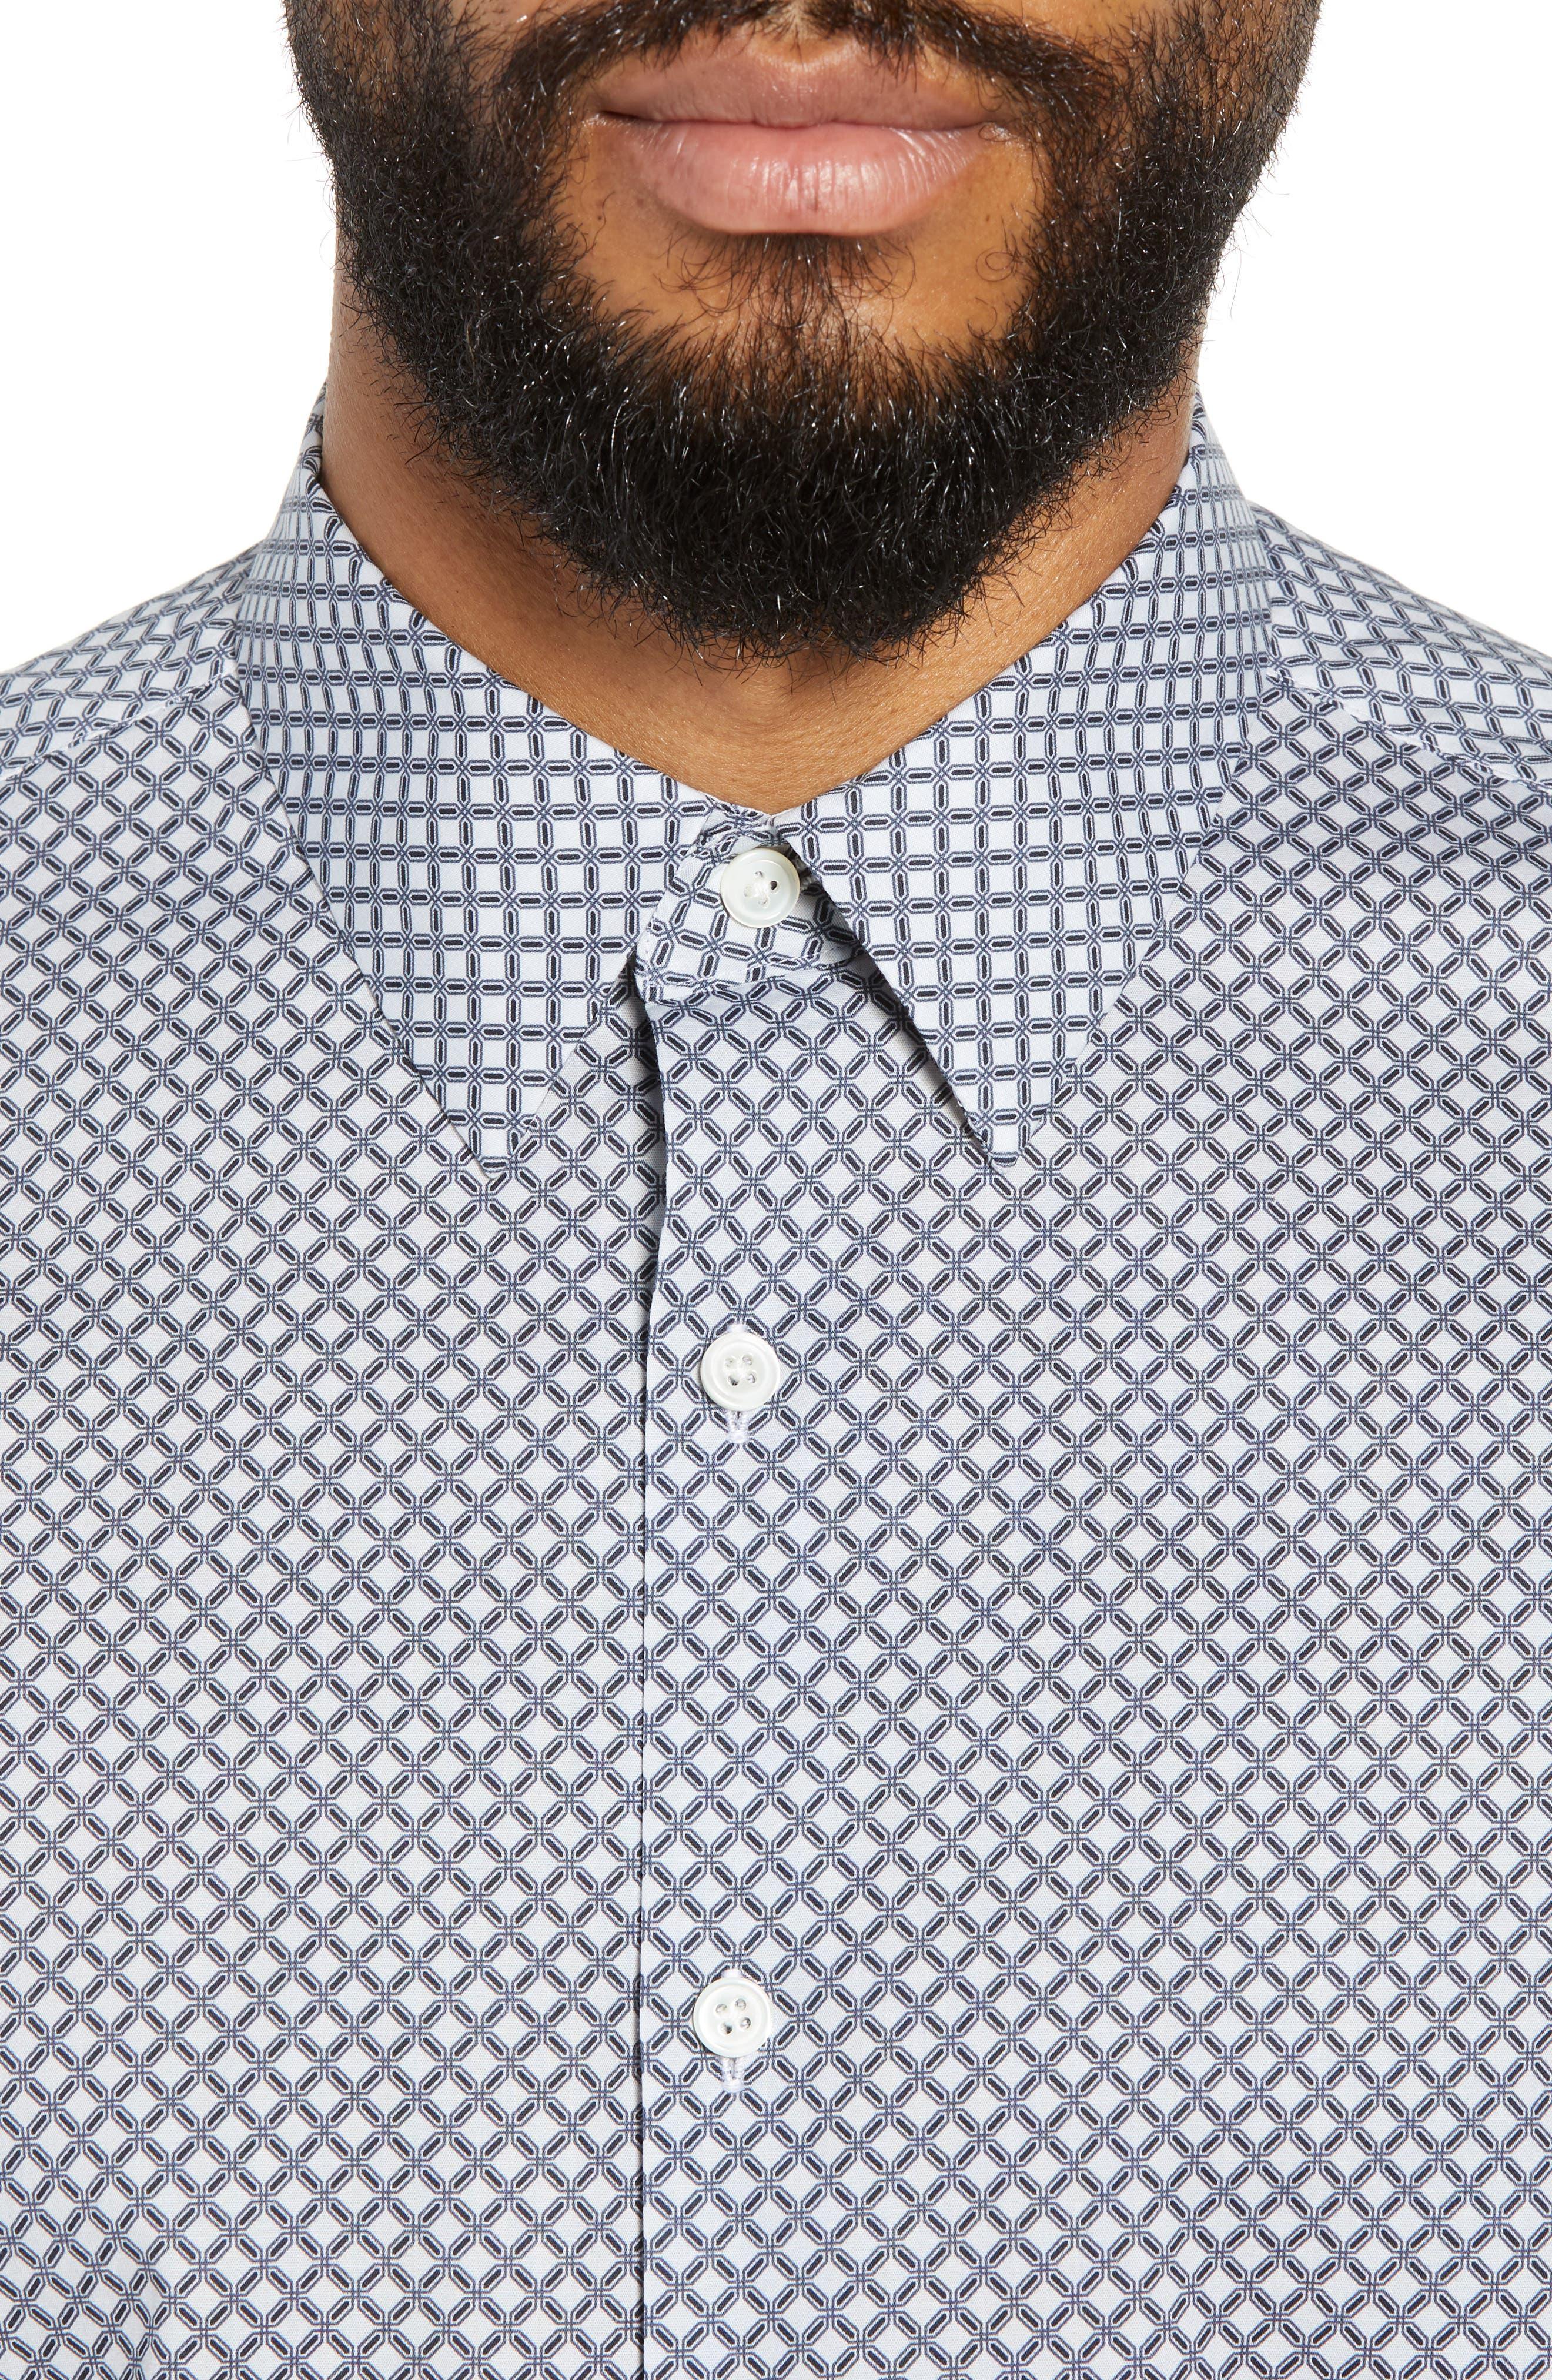 Menlo Halldale Slim Fit Stretch Short Sleeve Sport Shirt,                             Alternate thumbnail 4, color,                             SHALE MULTI